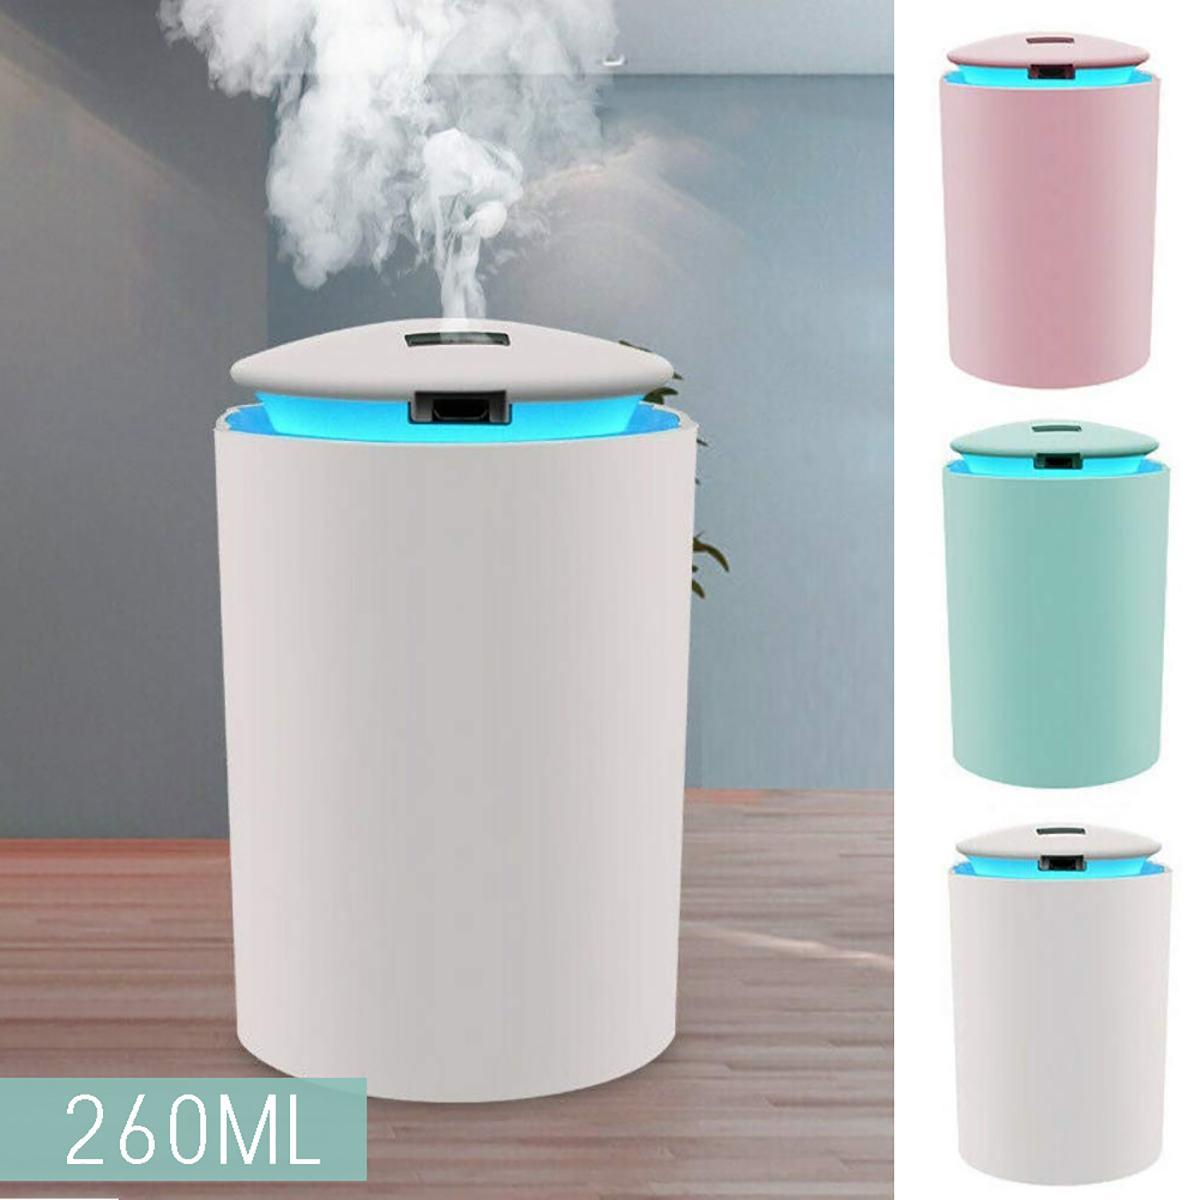 260ML Mini Ultrasonic Air Humidifier Romantic Soft Light USB Essential Oil Diffuser Car Purifier Aroma Anion Mist Maker